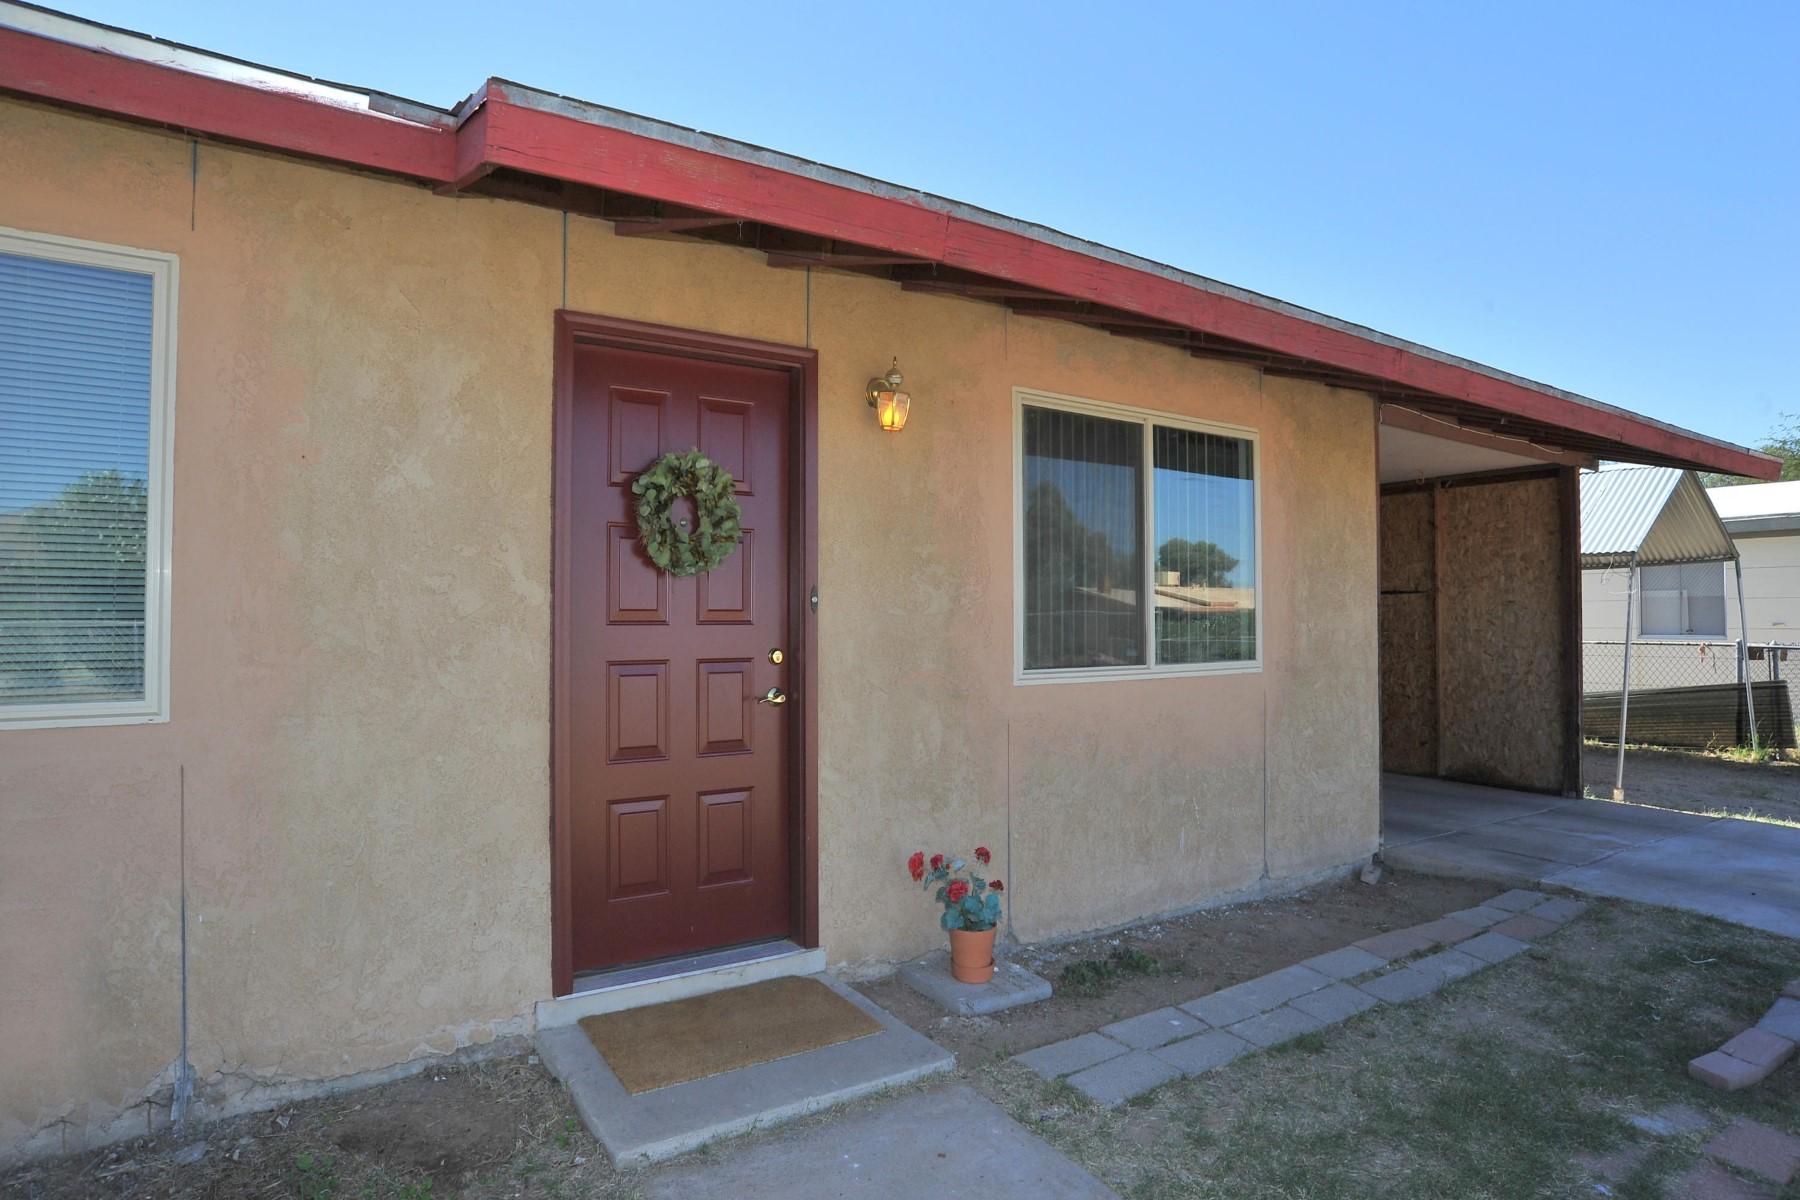 獨棟家庭住宅 為 出售 在 Darling single level home 5352 E 32nd Street Tucson, 亞利桑那州, 85711 美國